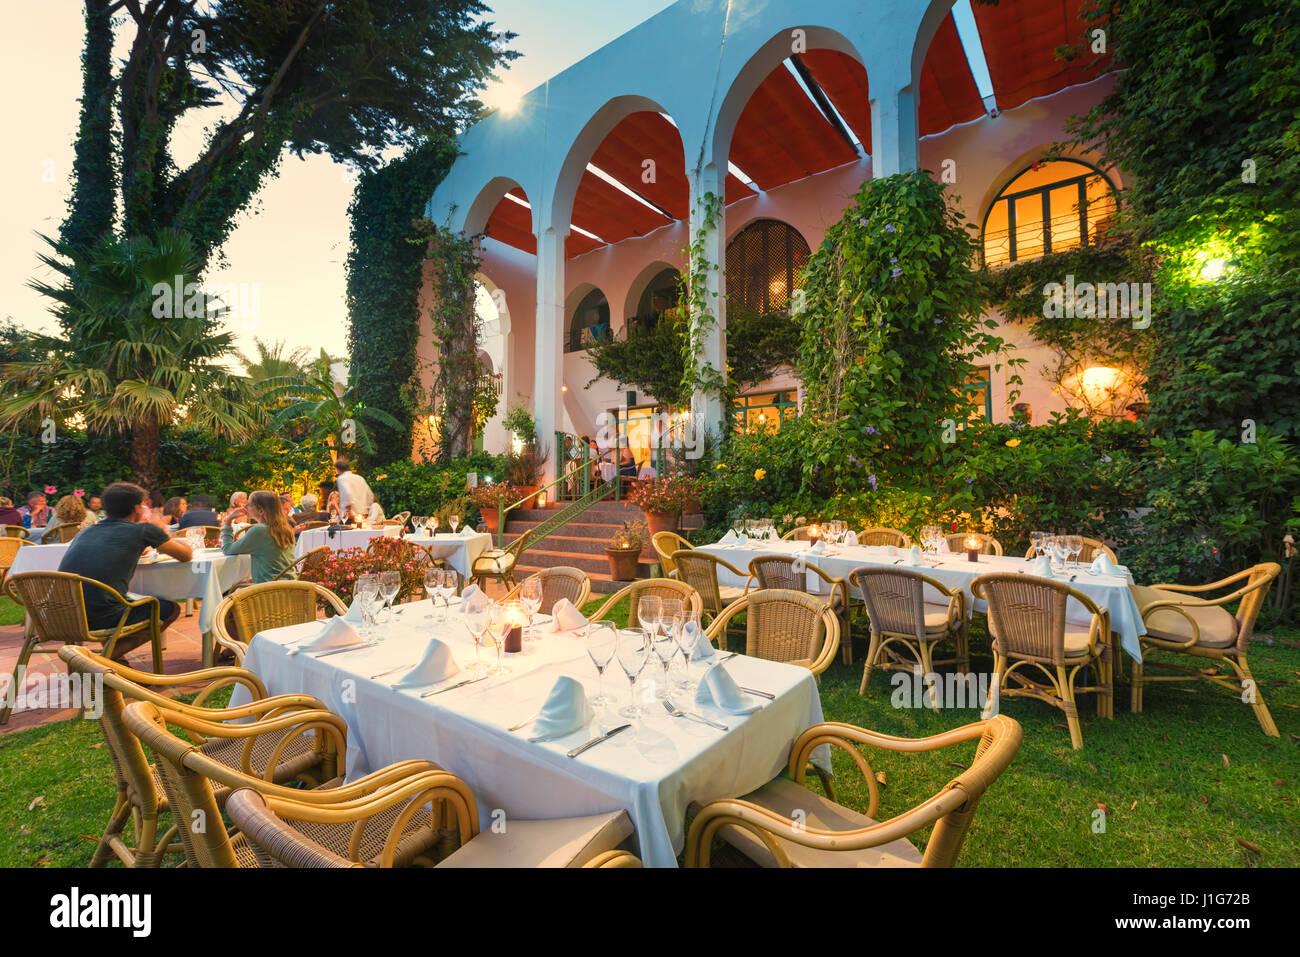 Hurricane hotel tarifa restaurant